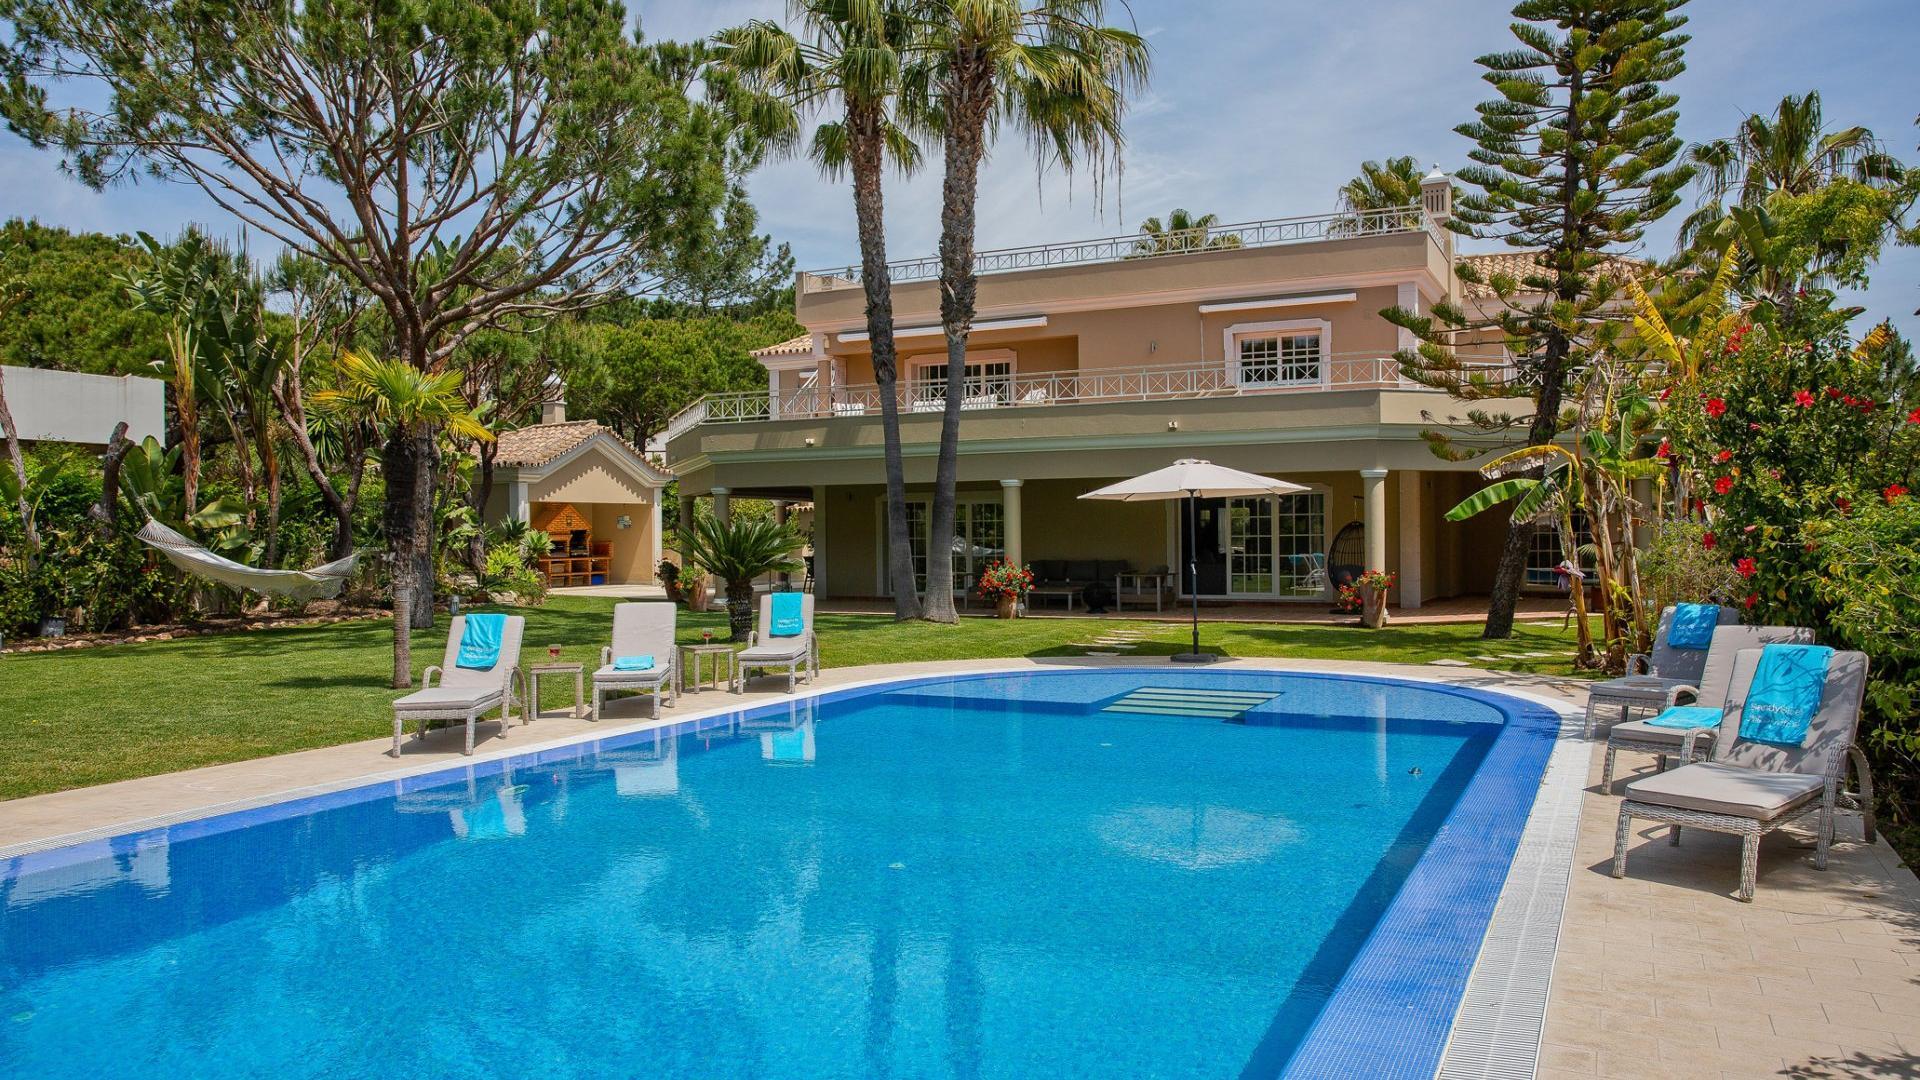 Villa Lirio - Vale do Garrão, Vale do Lobo, Algarve - _P1_6381.jpg